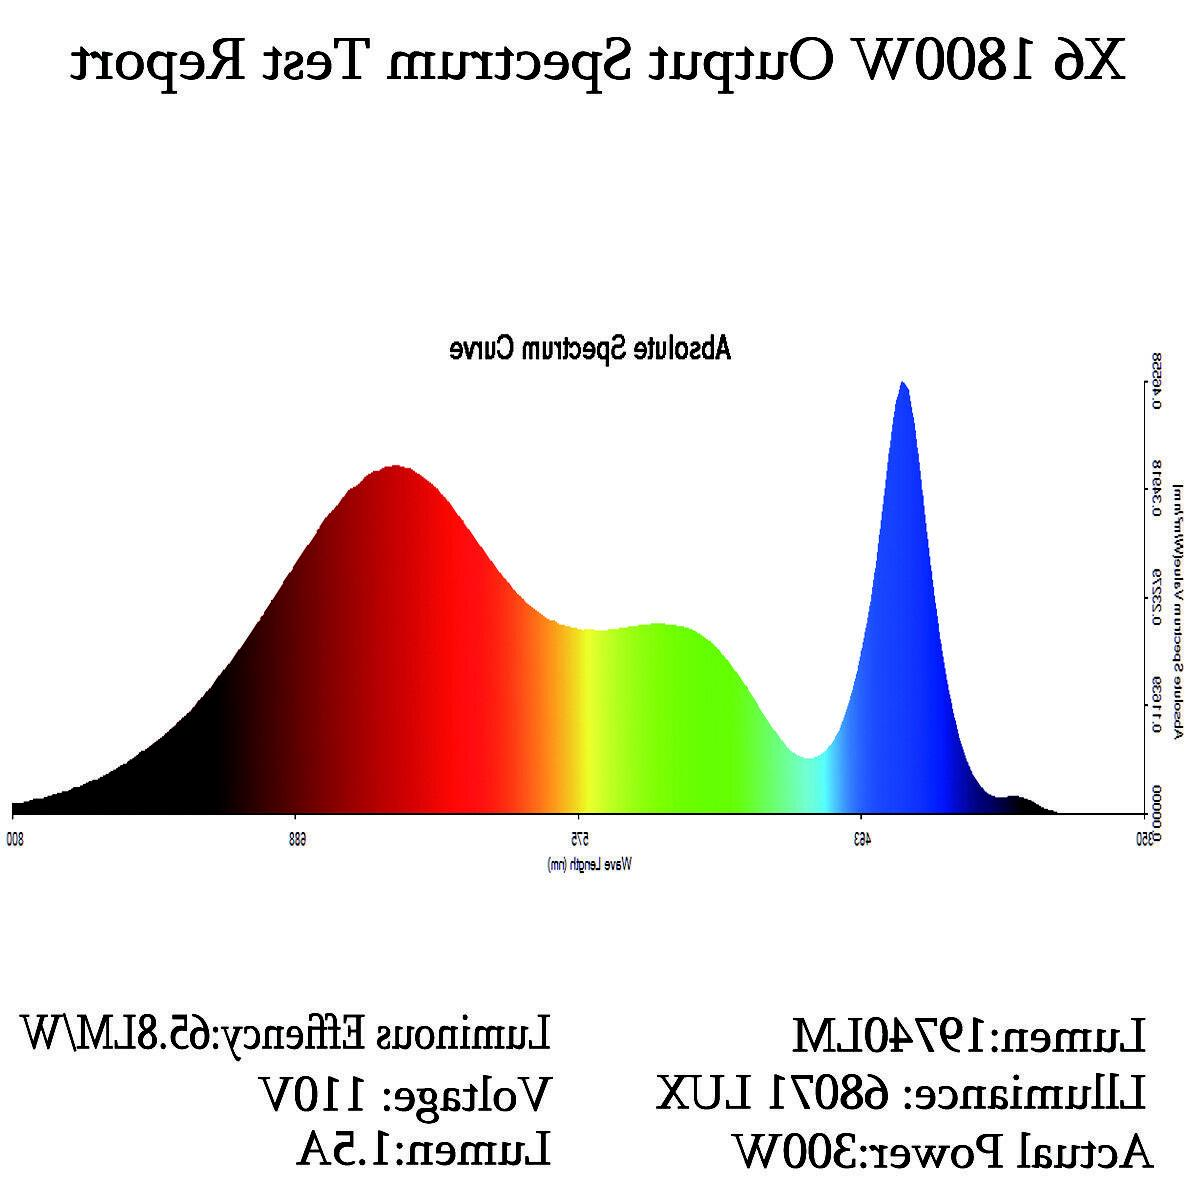 1800W Sunshine Spectrum Grow Light